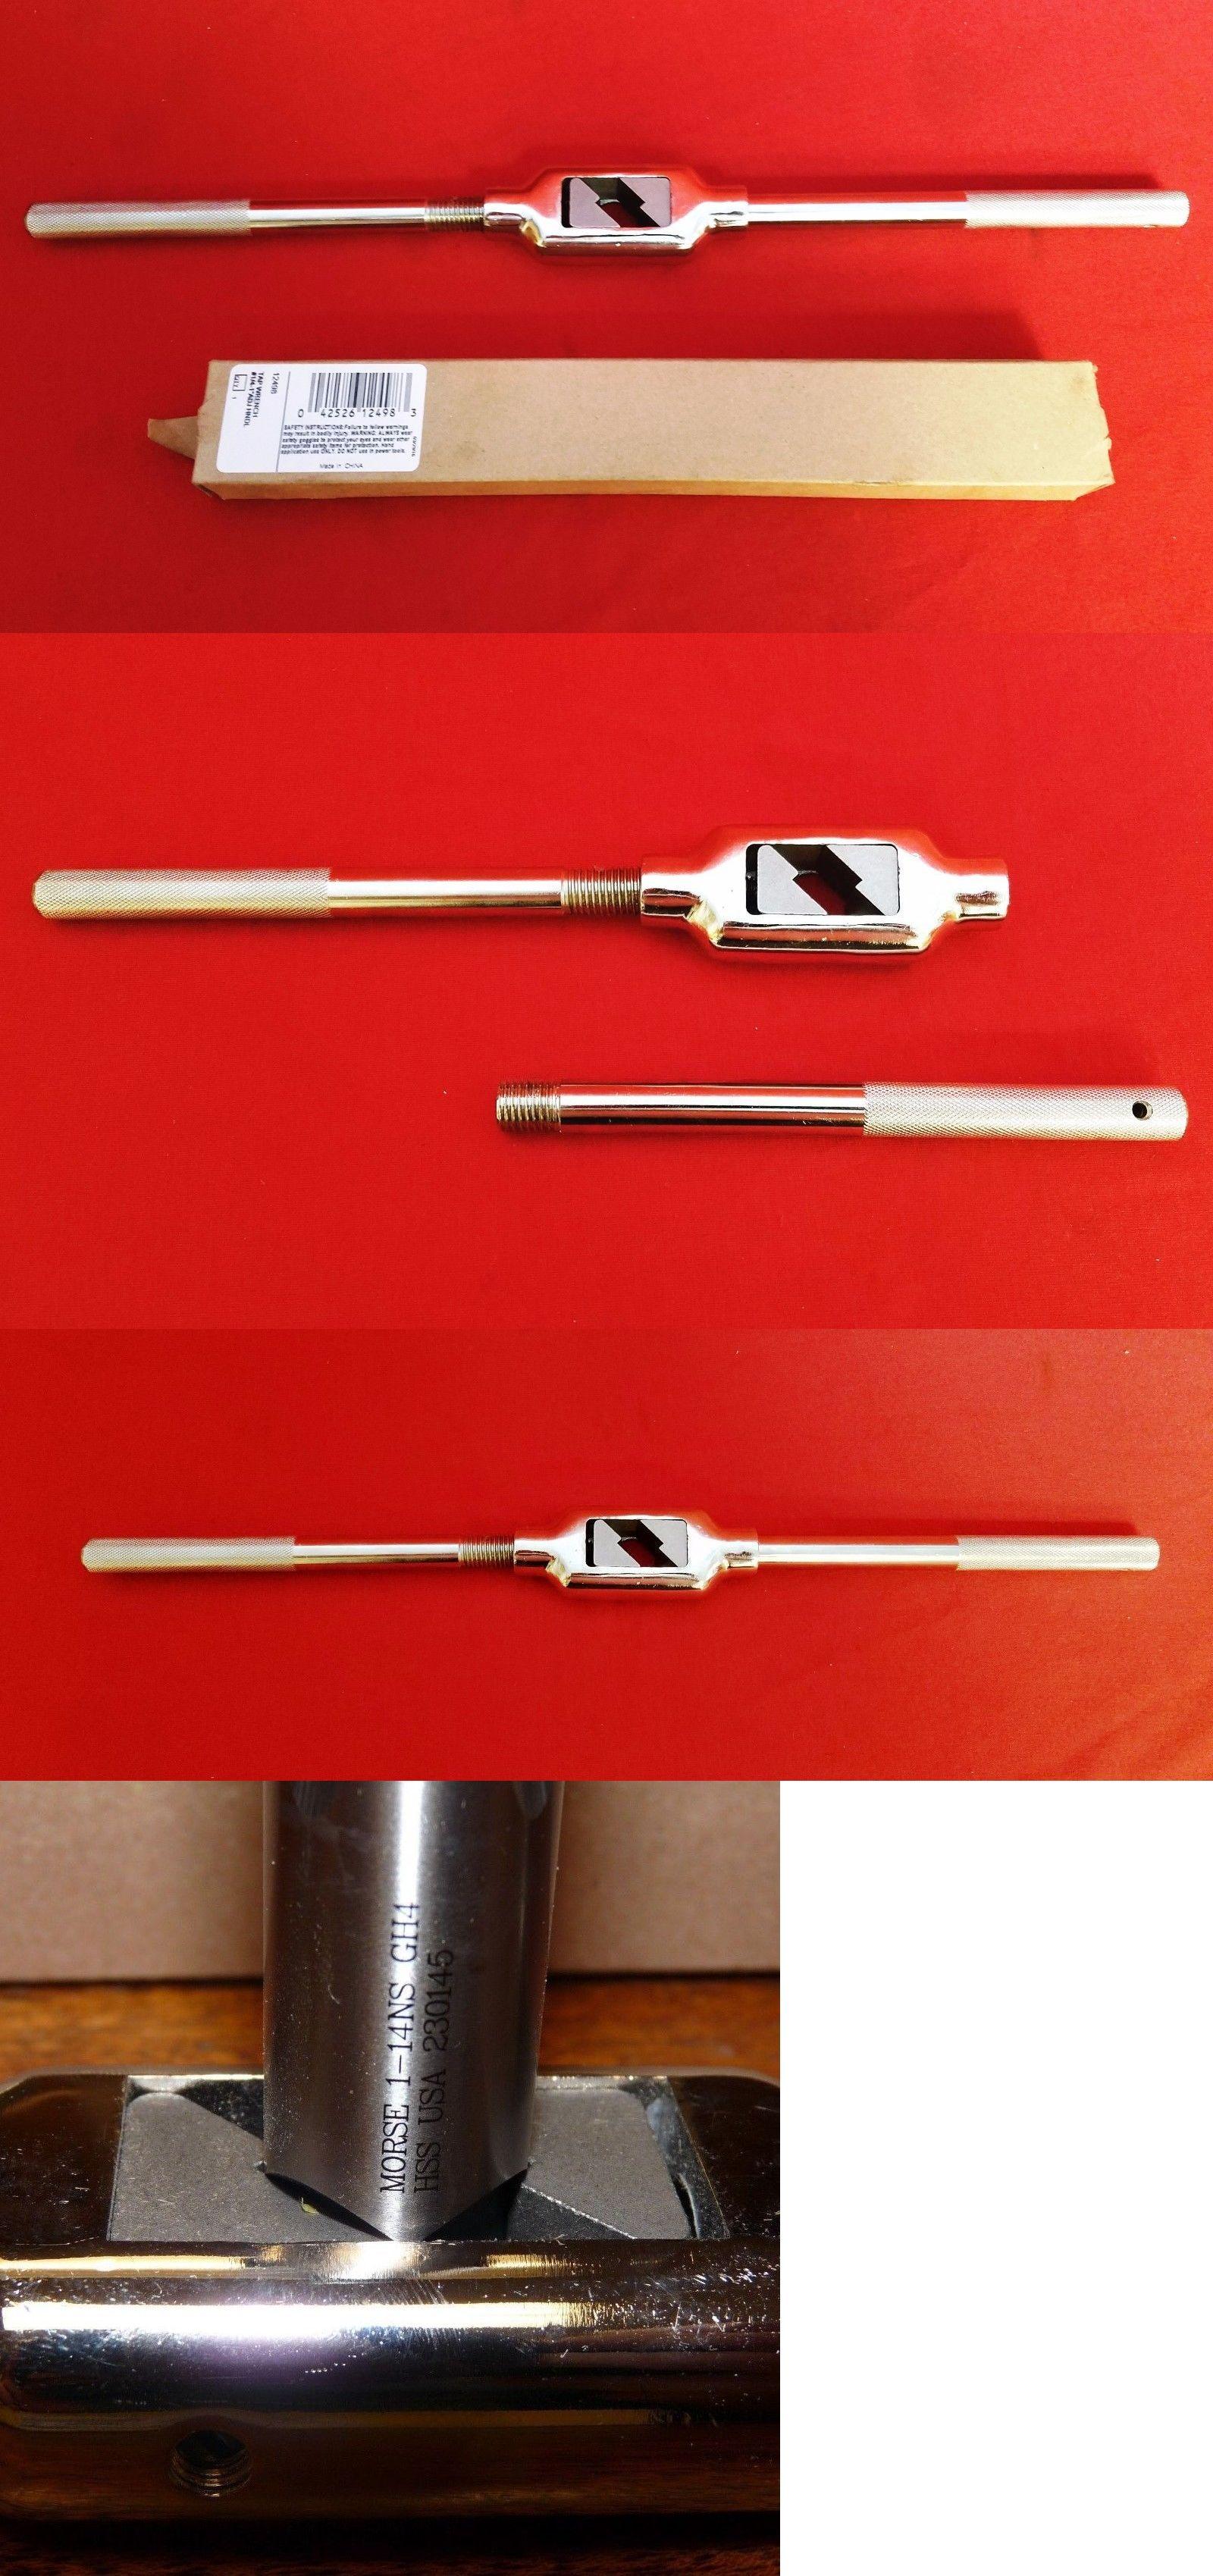 Irwin tap reamer handle adjustable holder tr mmmm